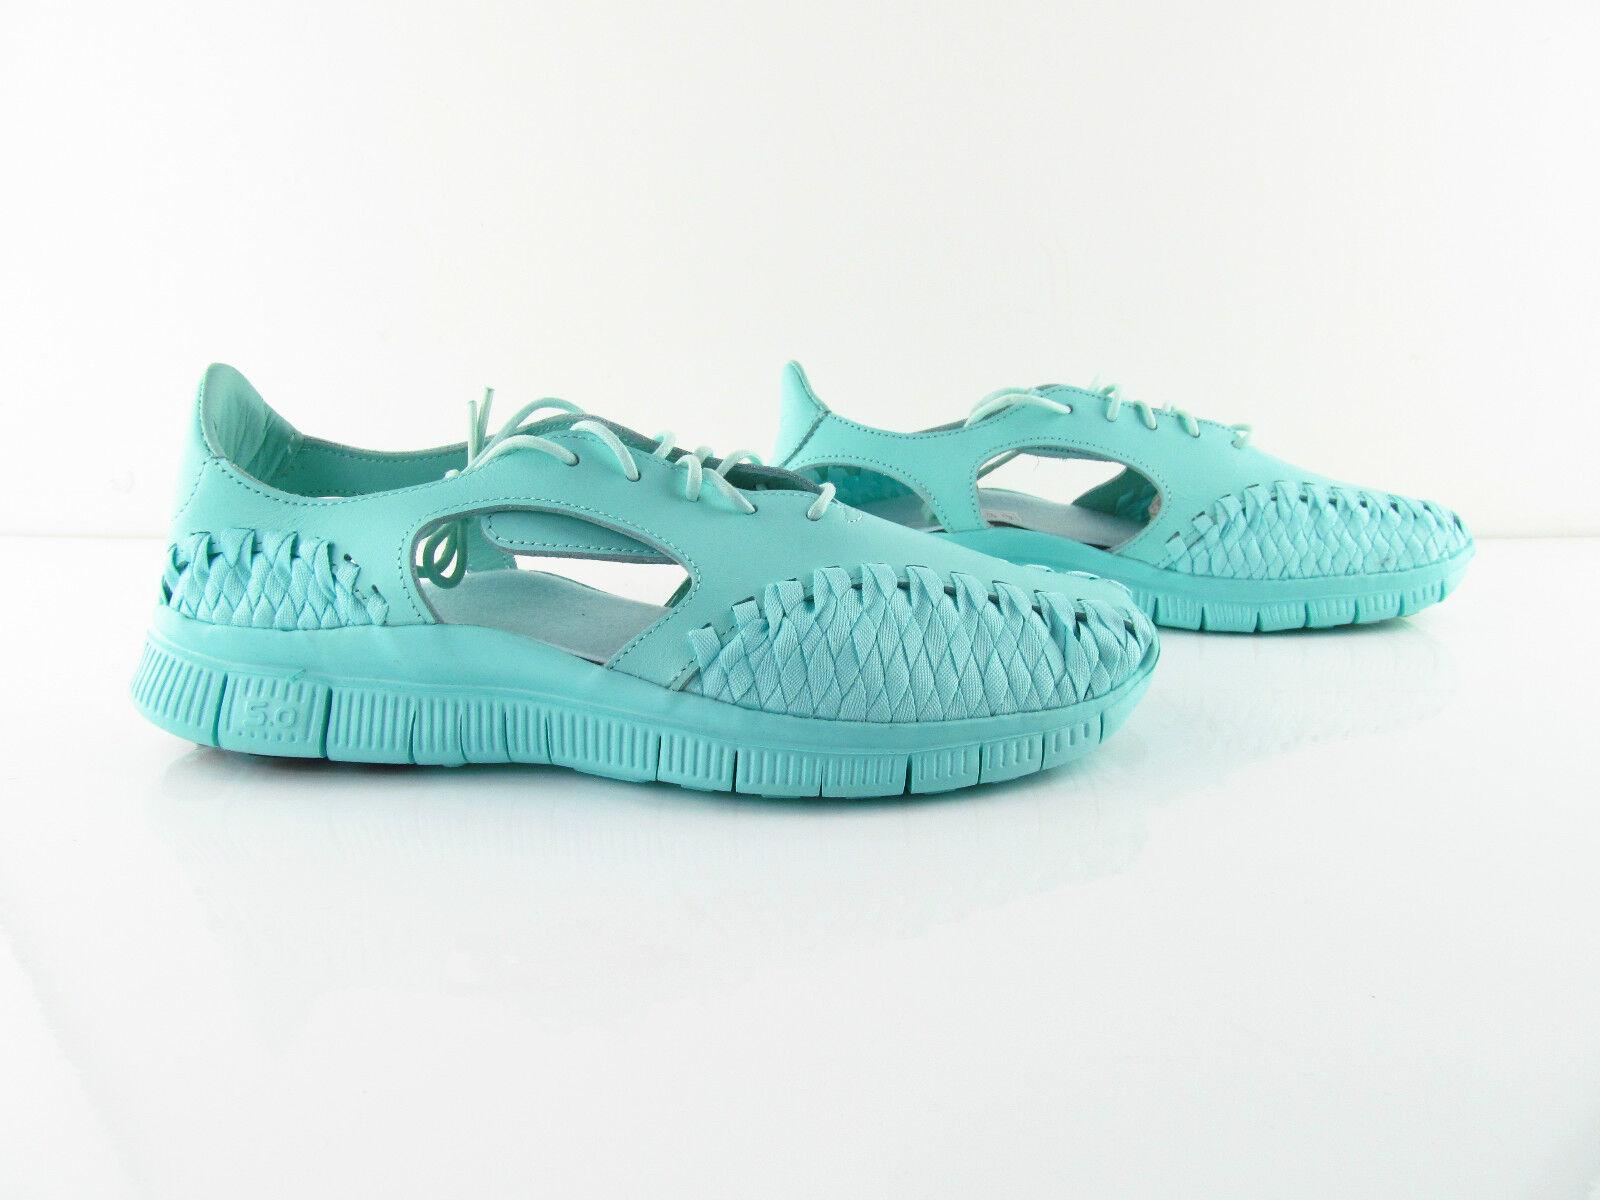 Nike Free Inneva Nikelab Woven wmns Emerald Mint Green New 813069 330